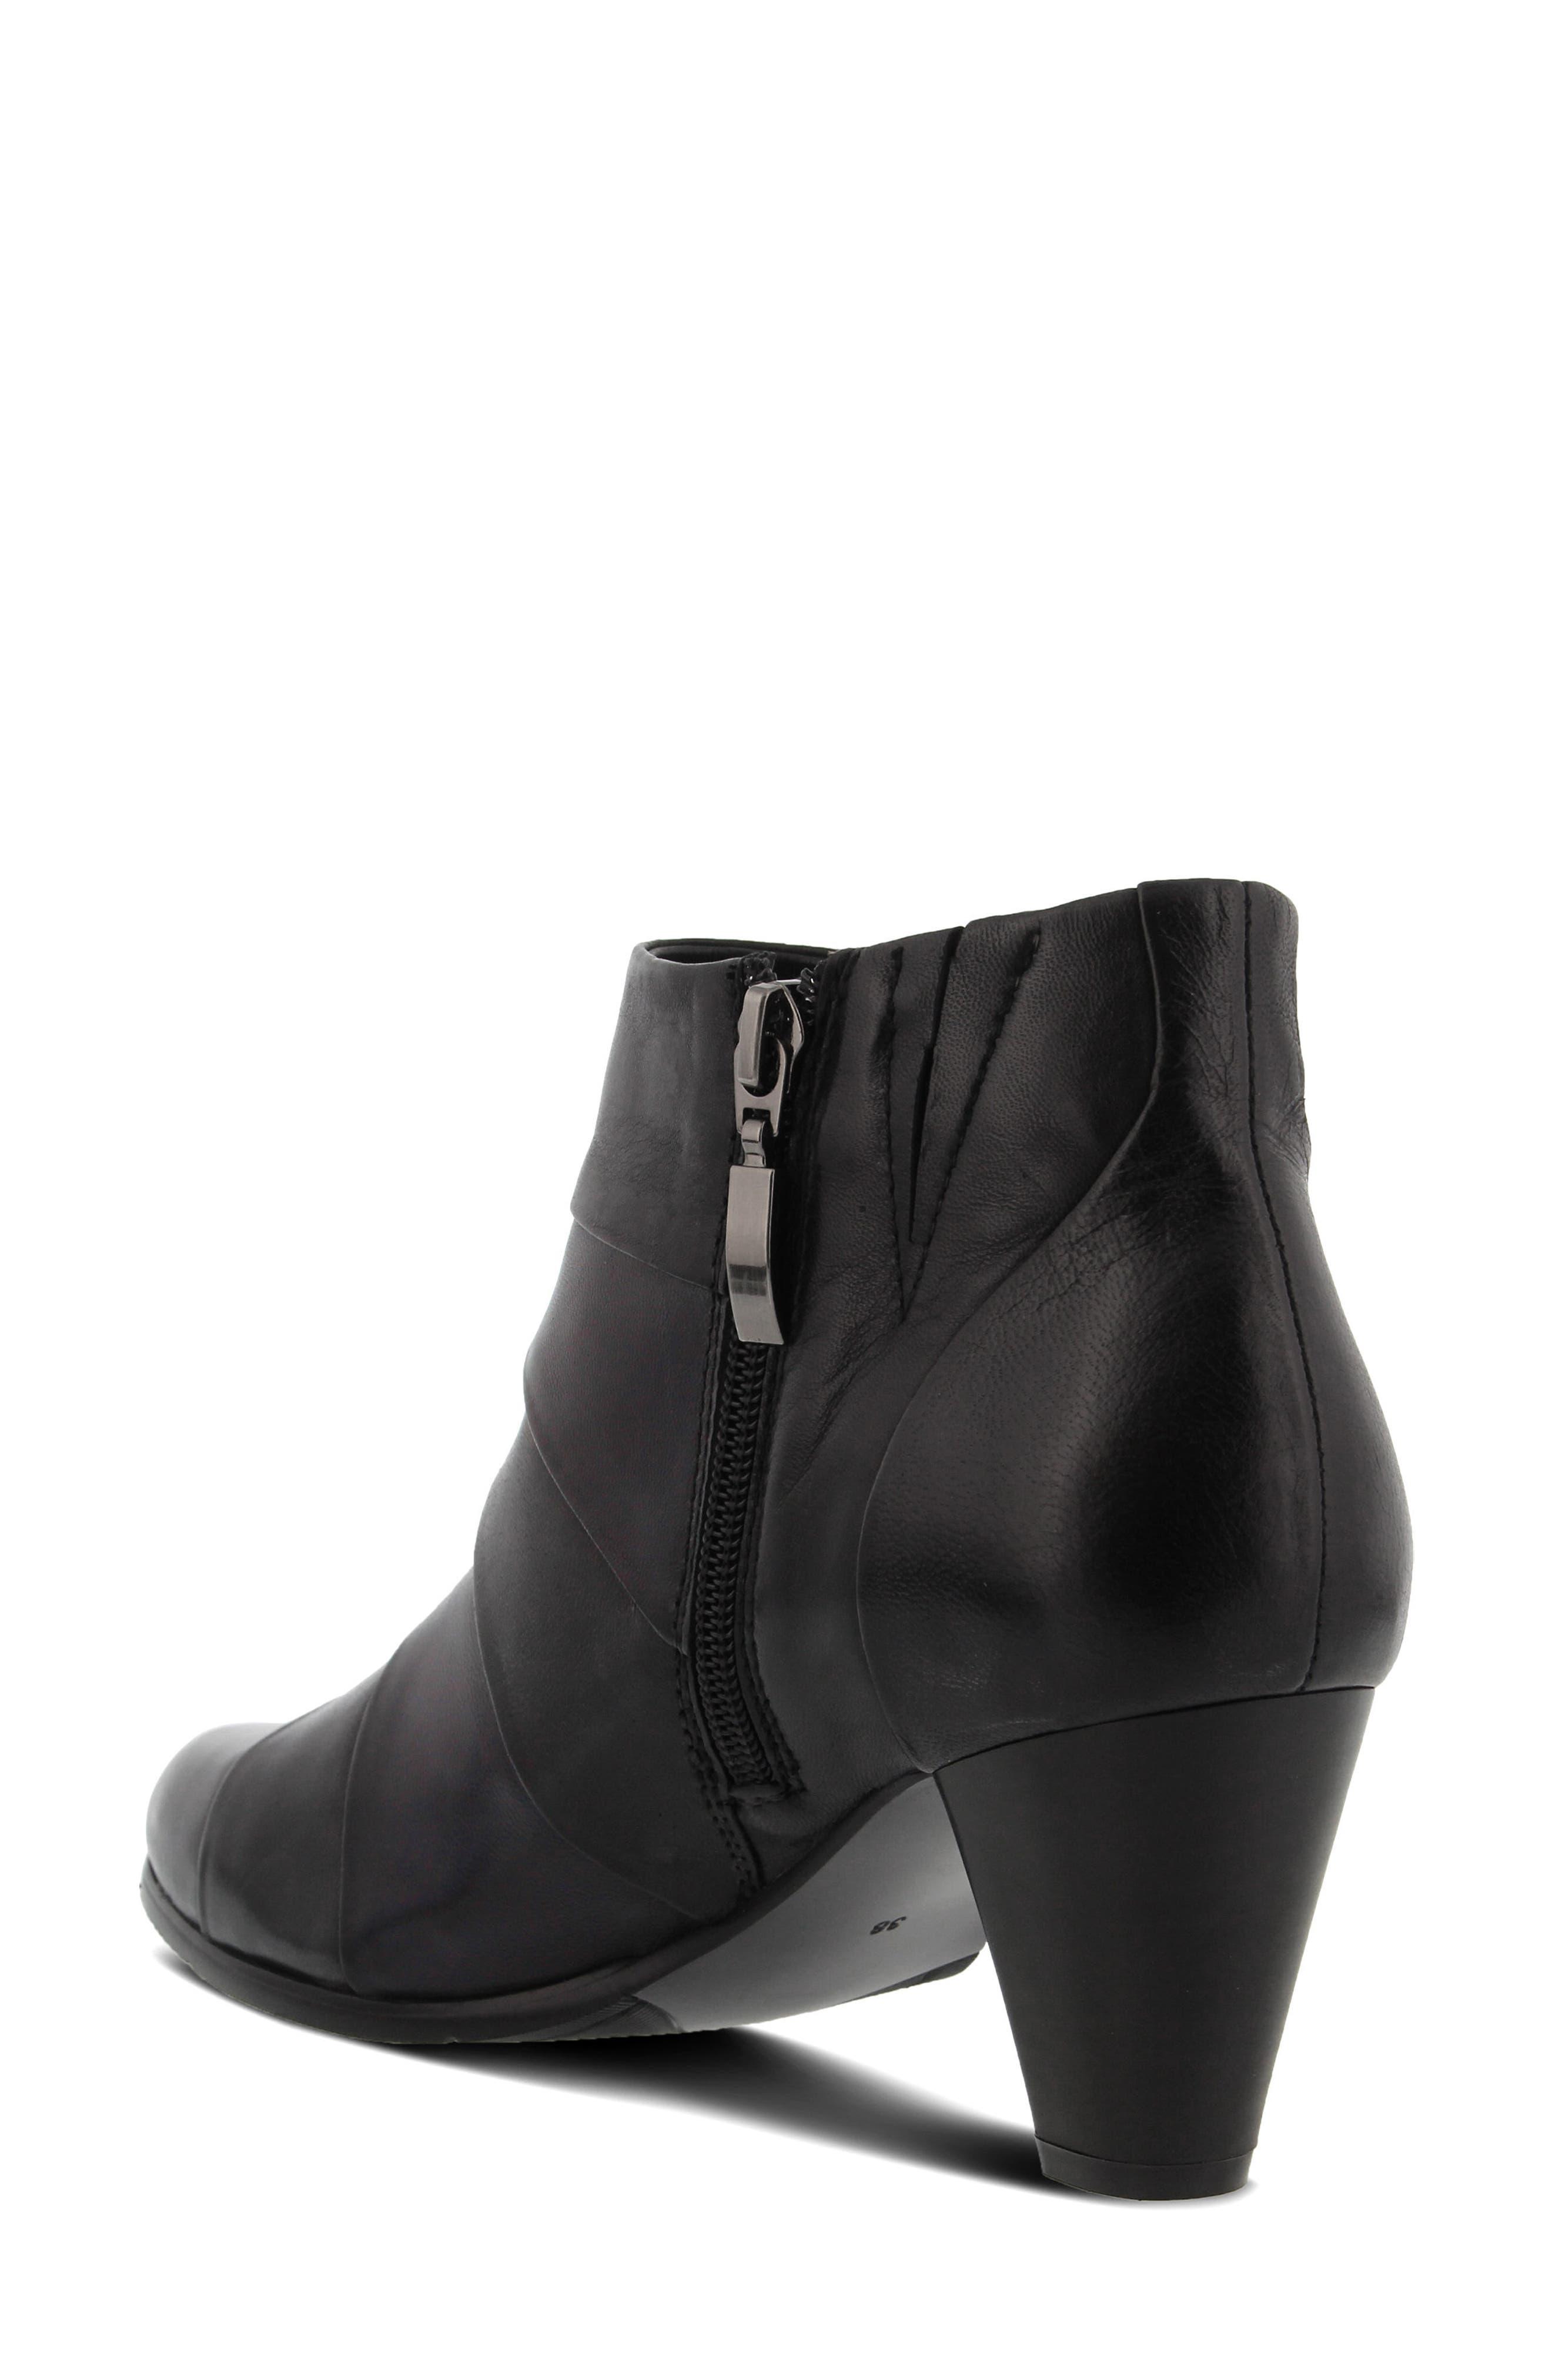 Binzo Bootie,                             Alternate thumbnail 2, color,                             Black Multi Leather